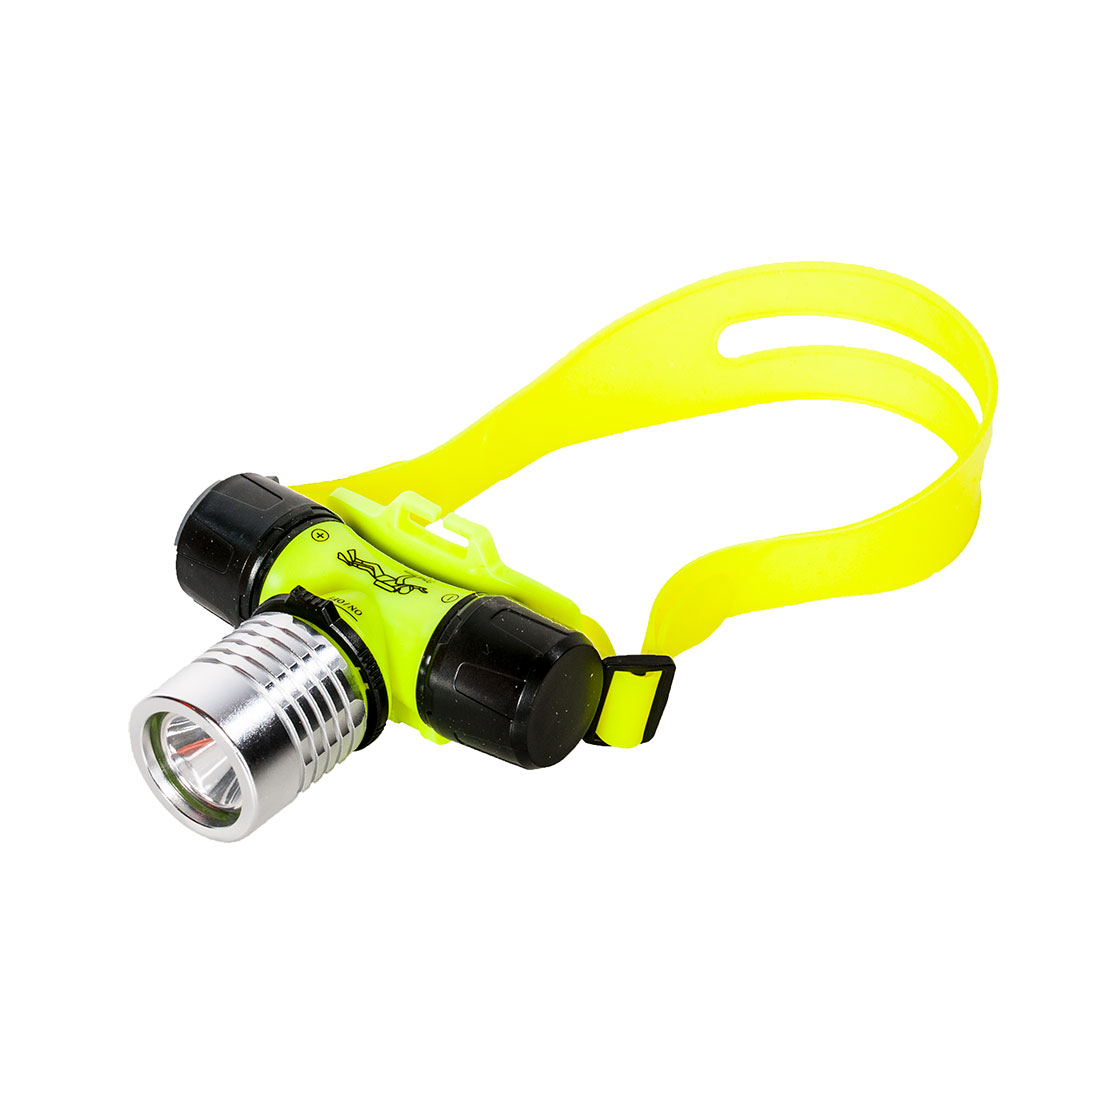 PA69 - Waterproof Headlight